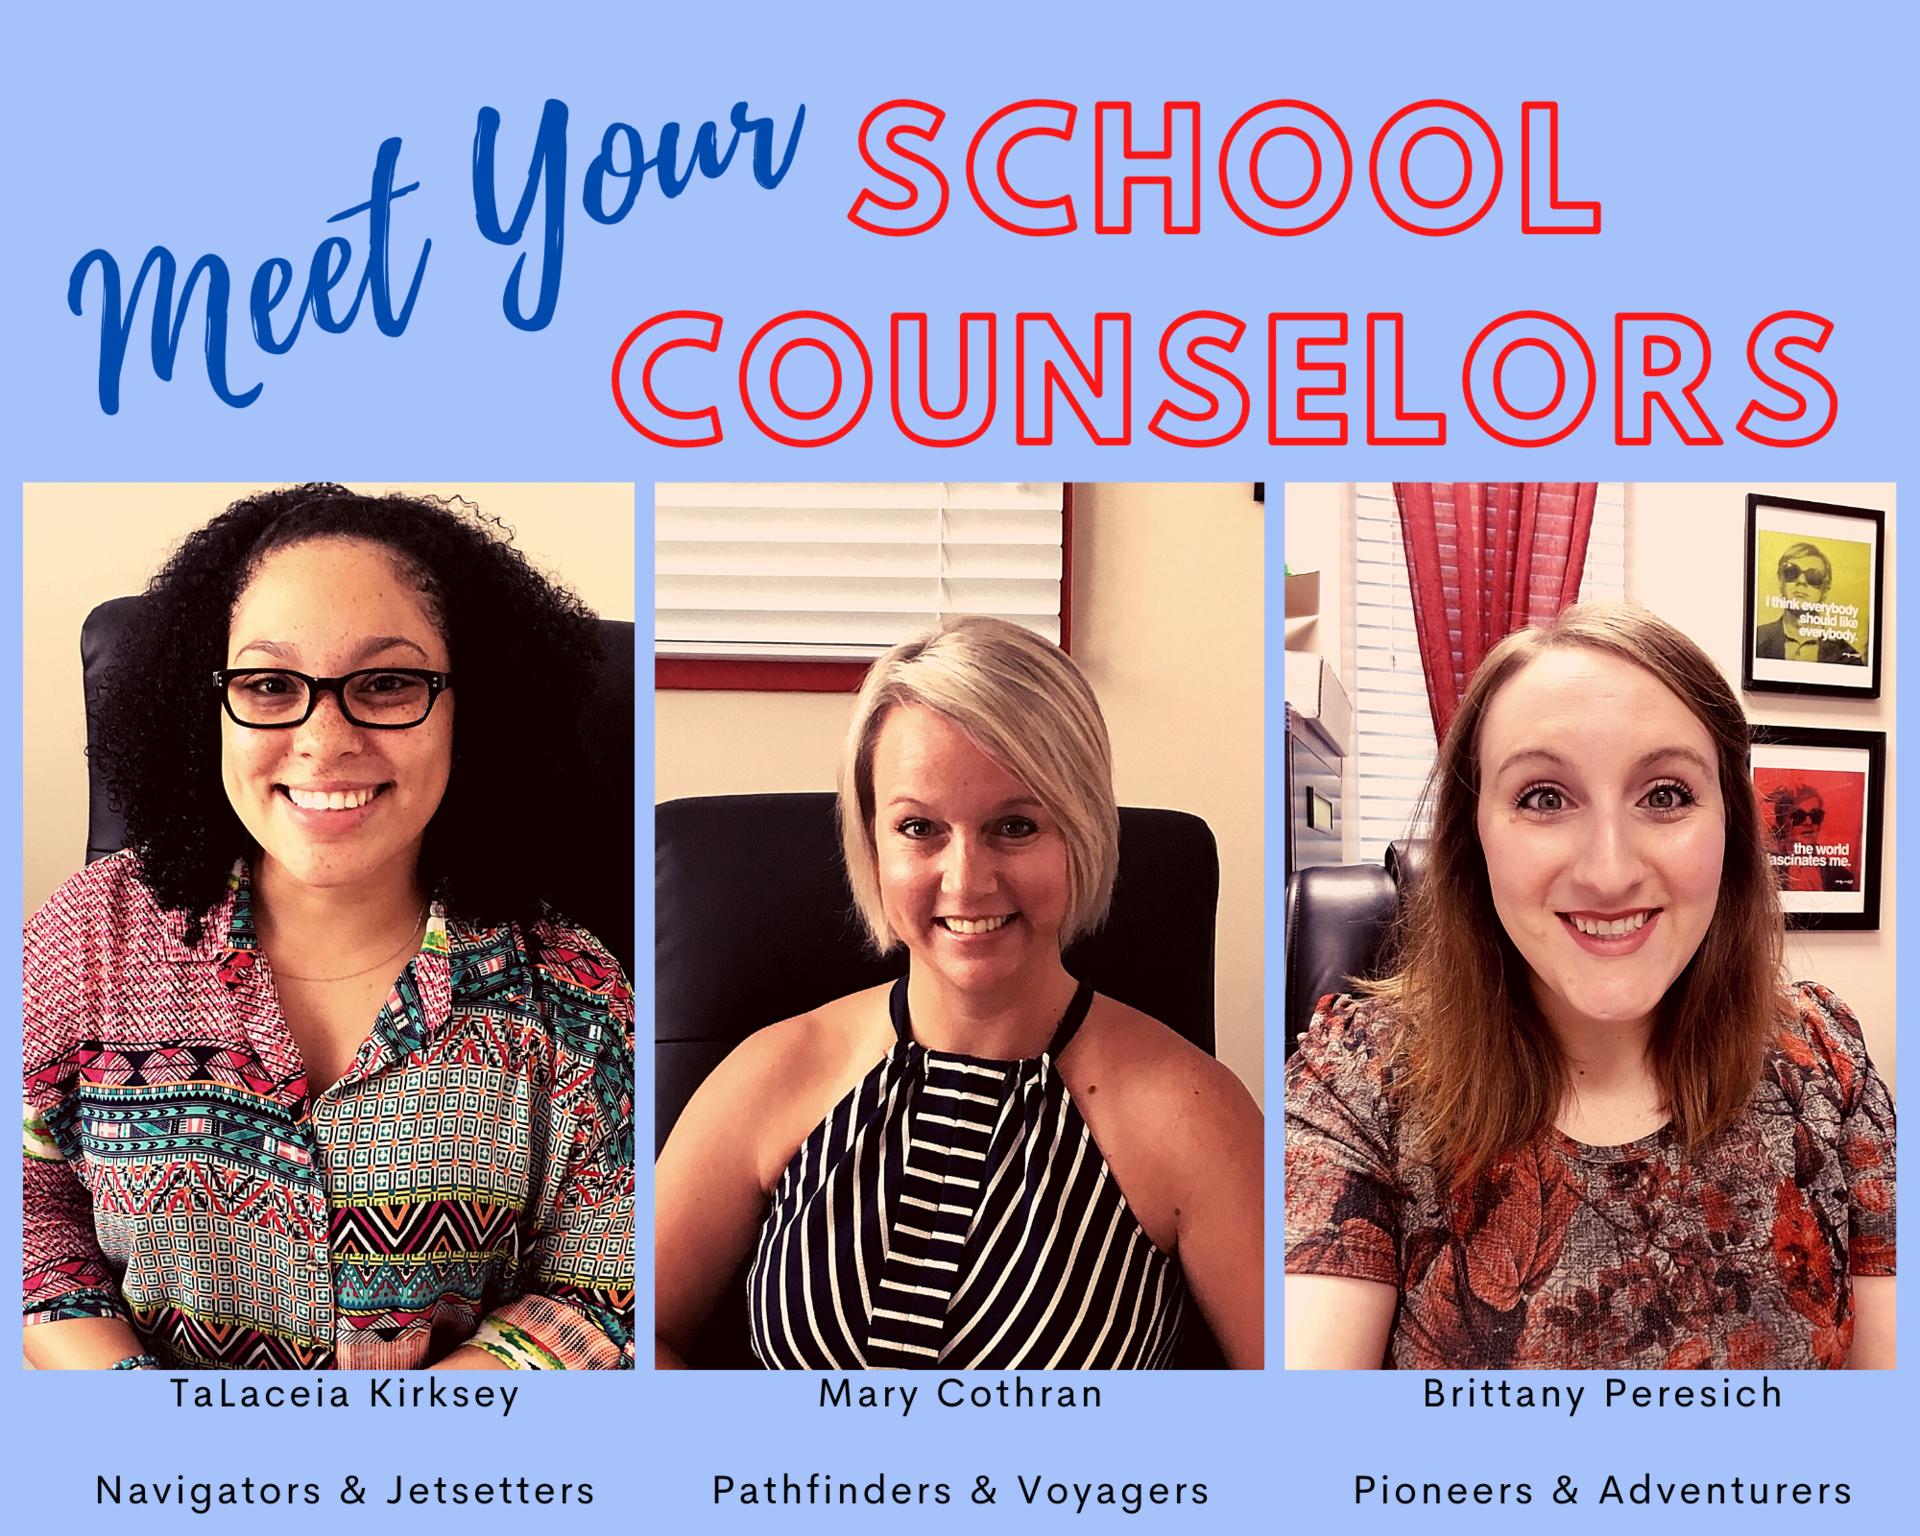 meet your school counselors